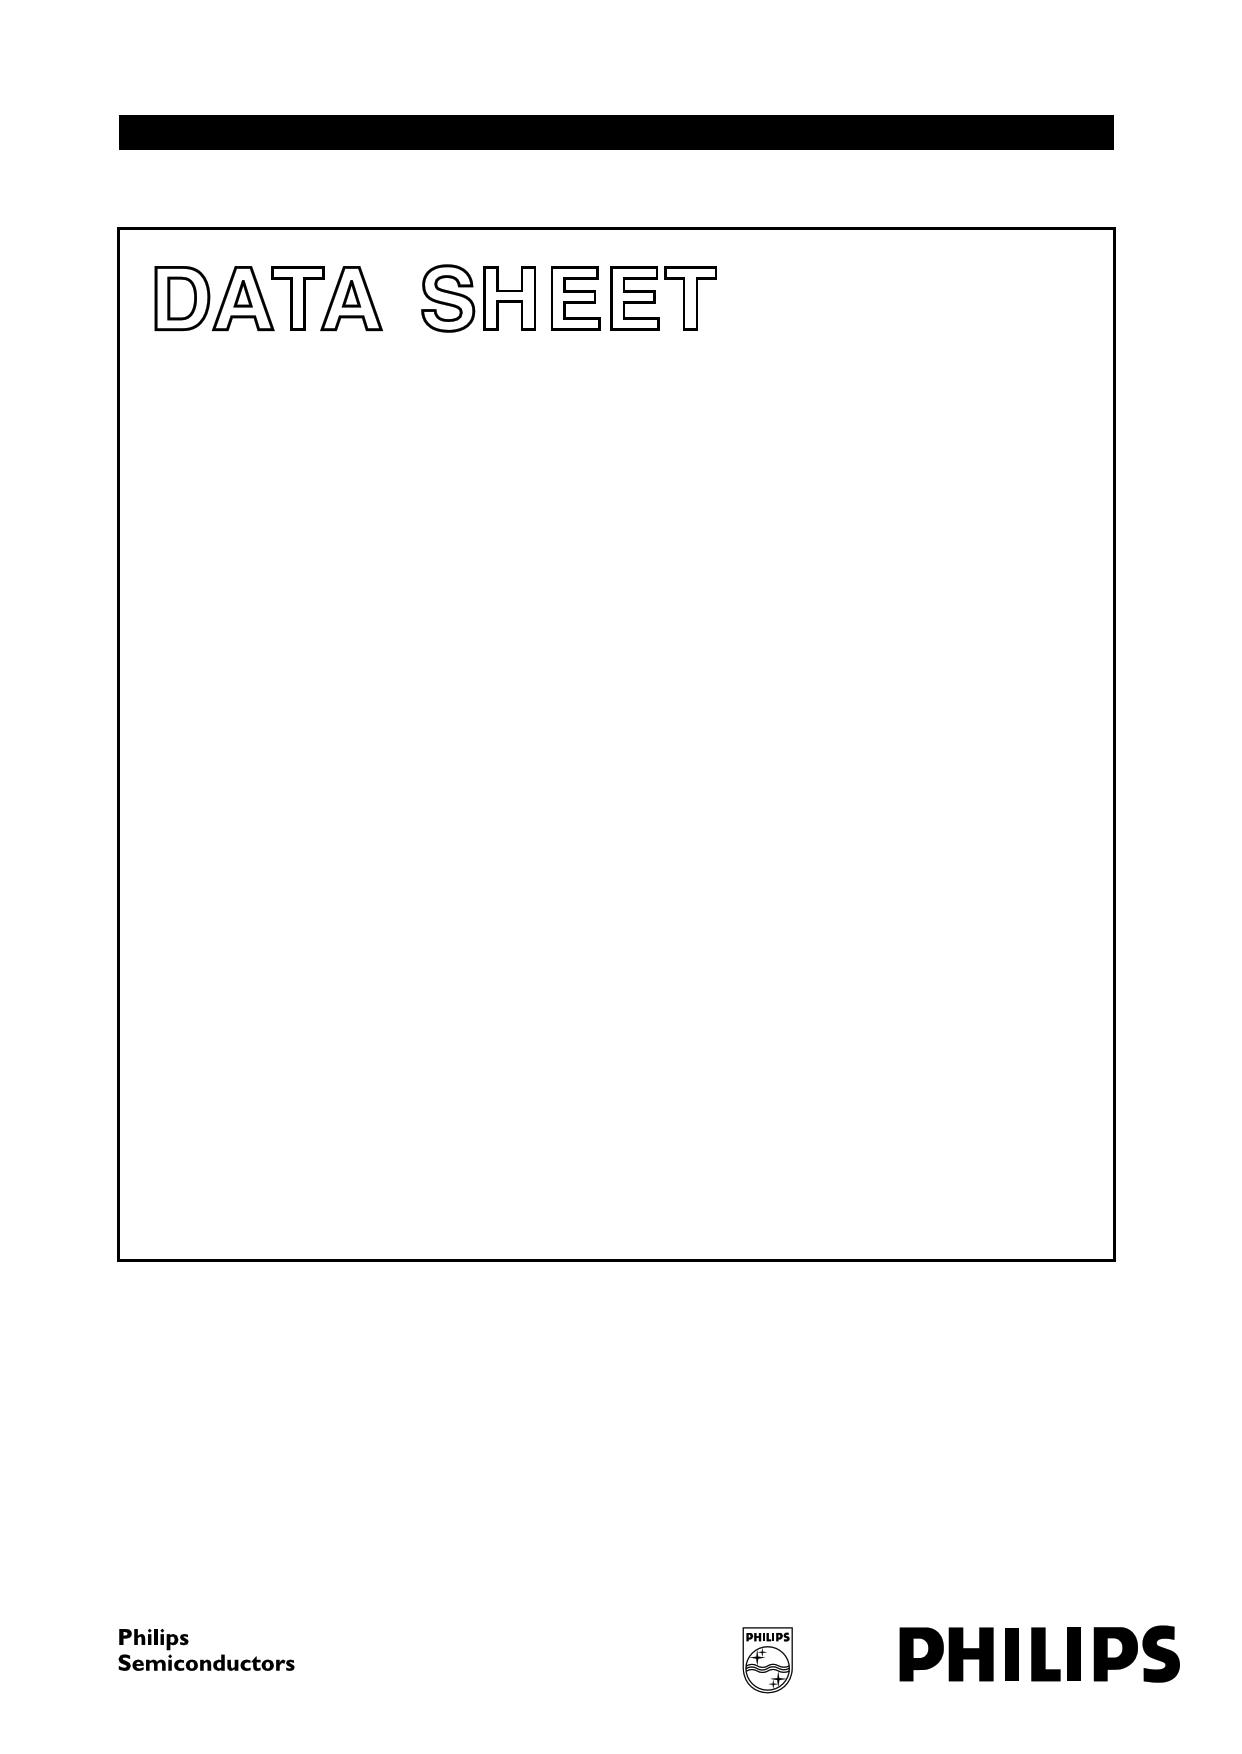 J108 даташит PDF